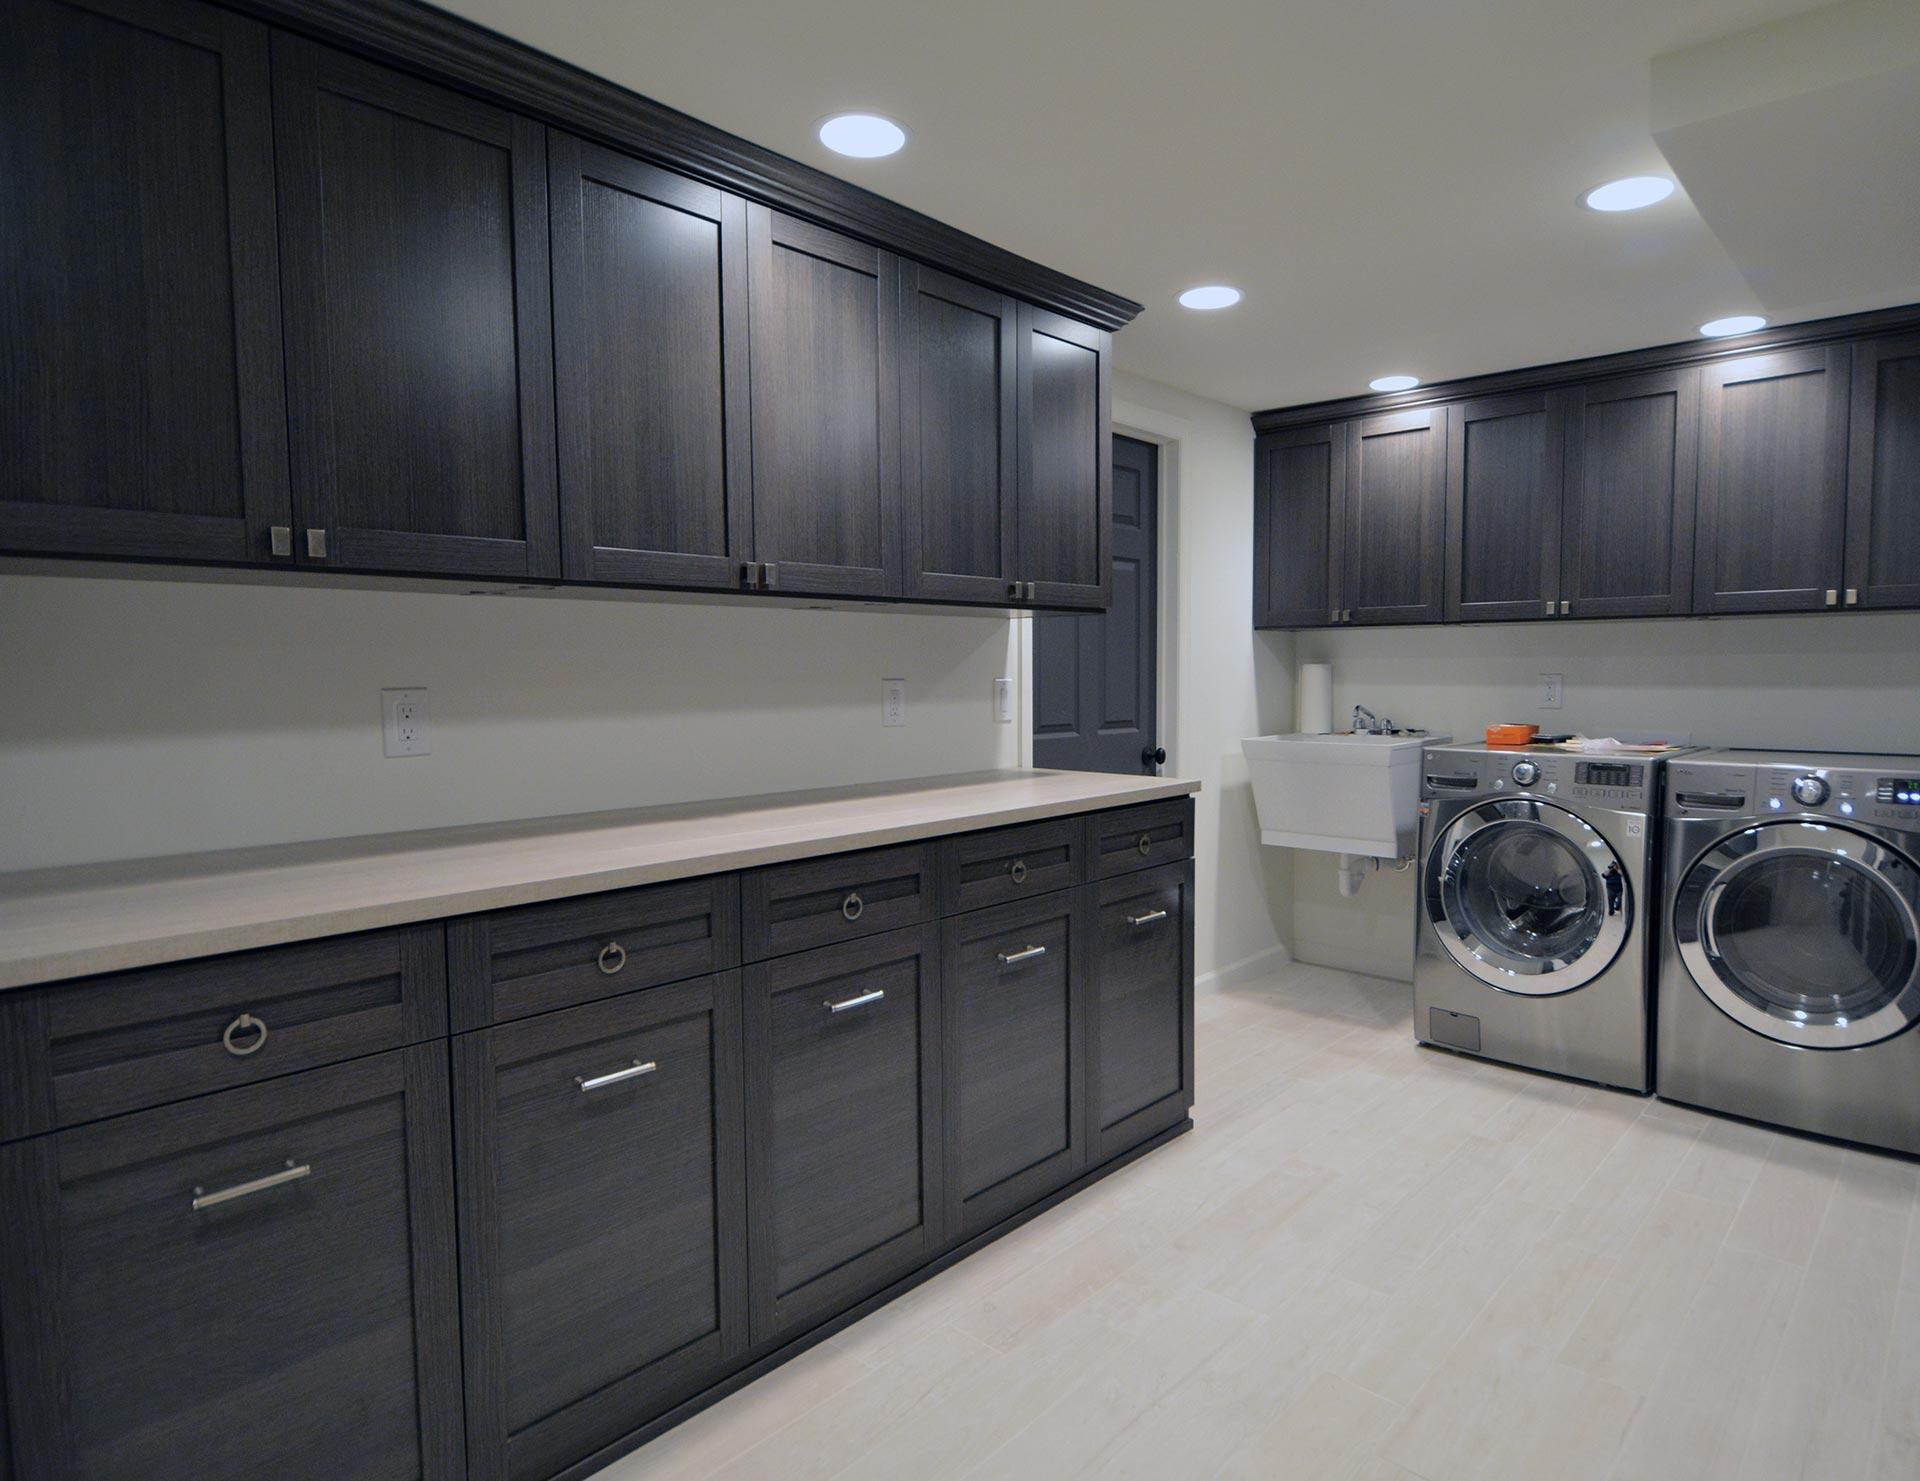 Laundry Room Cabinets & Storage Ideas | California Closets on Laundry Cabinets Ideas  id=50216